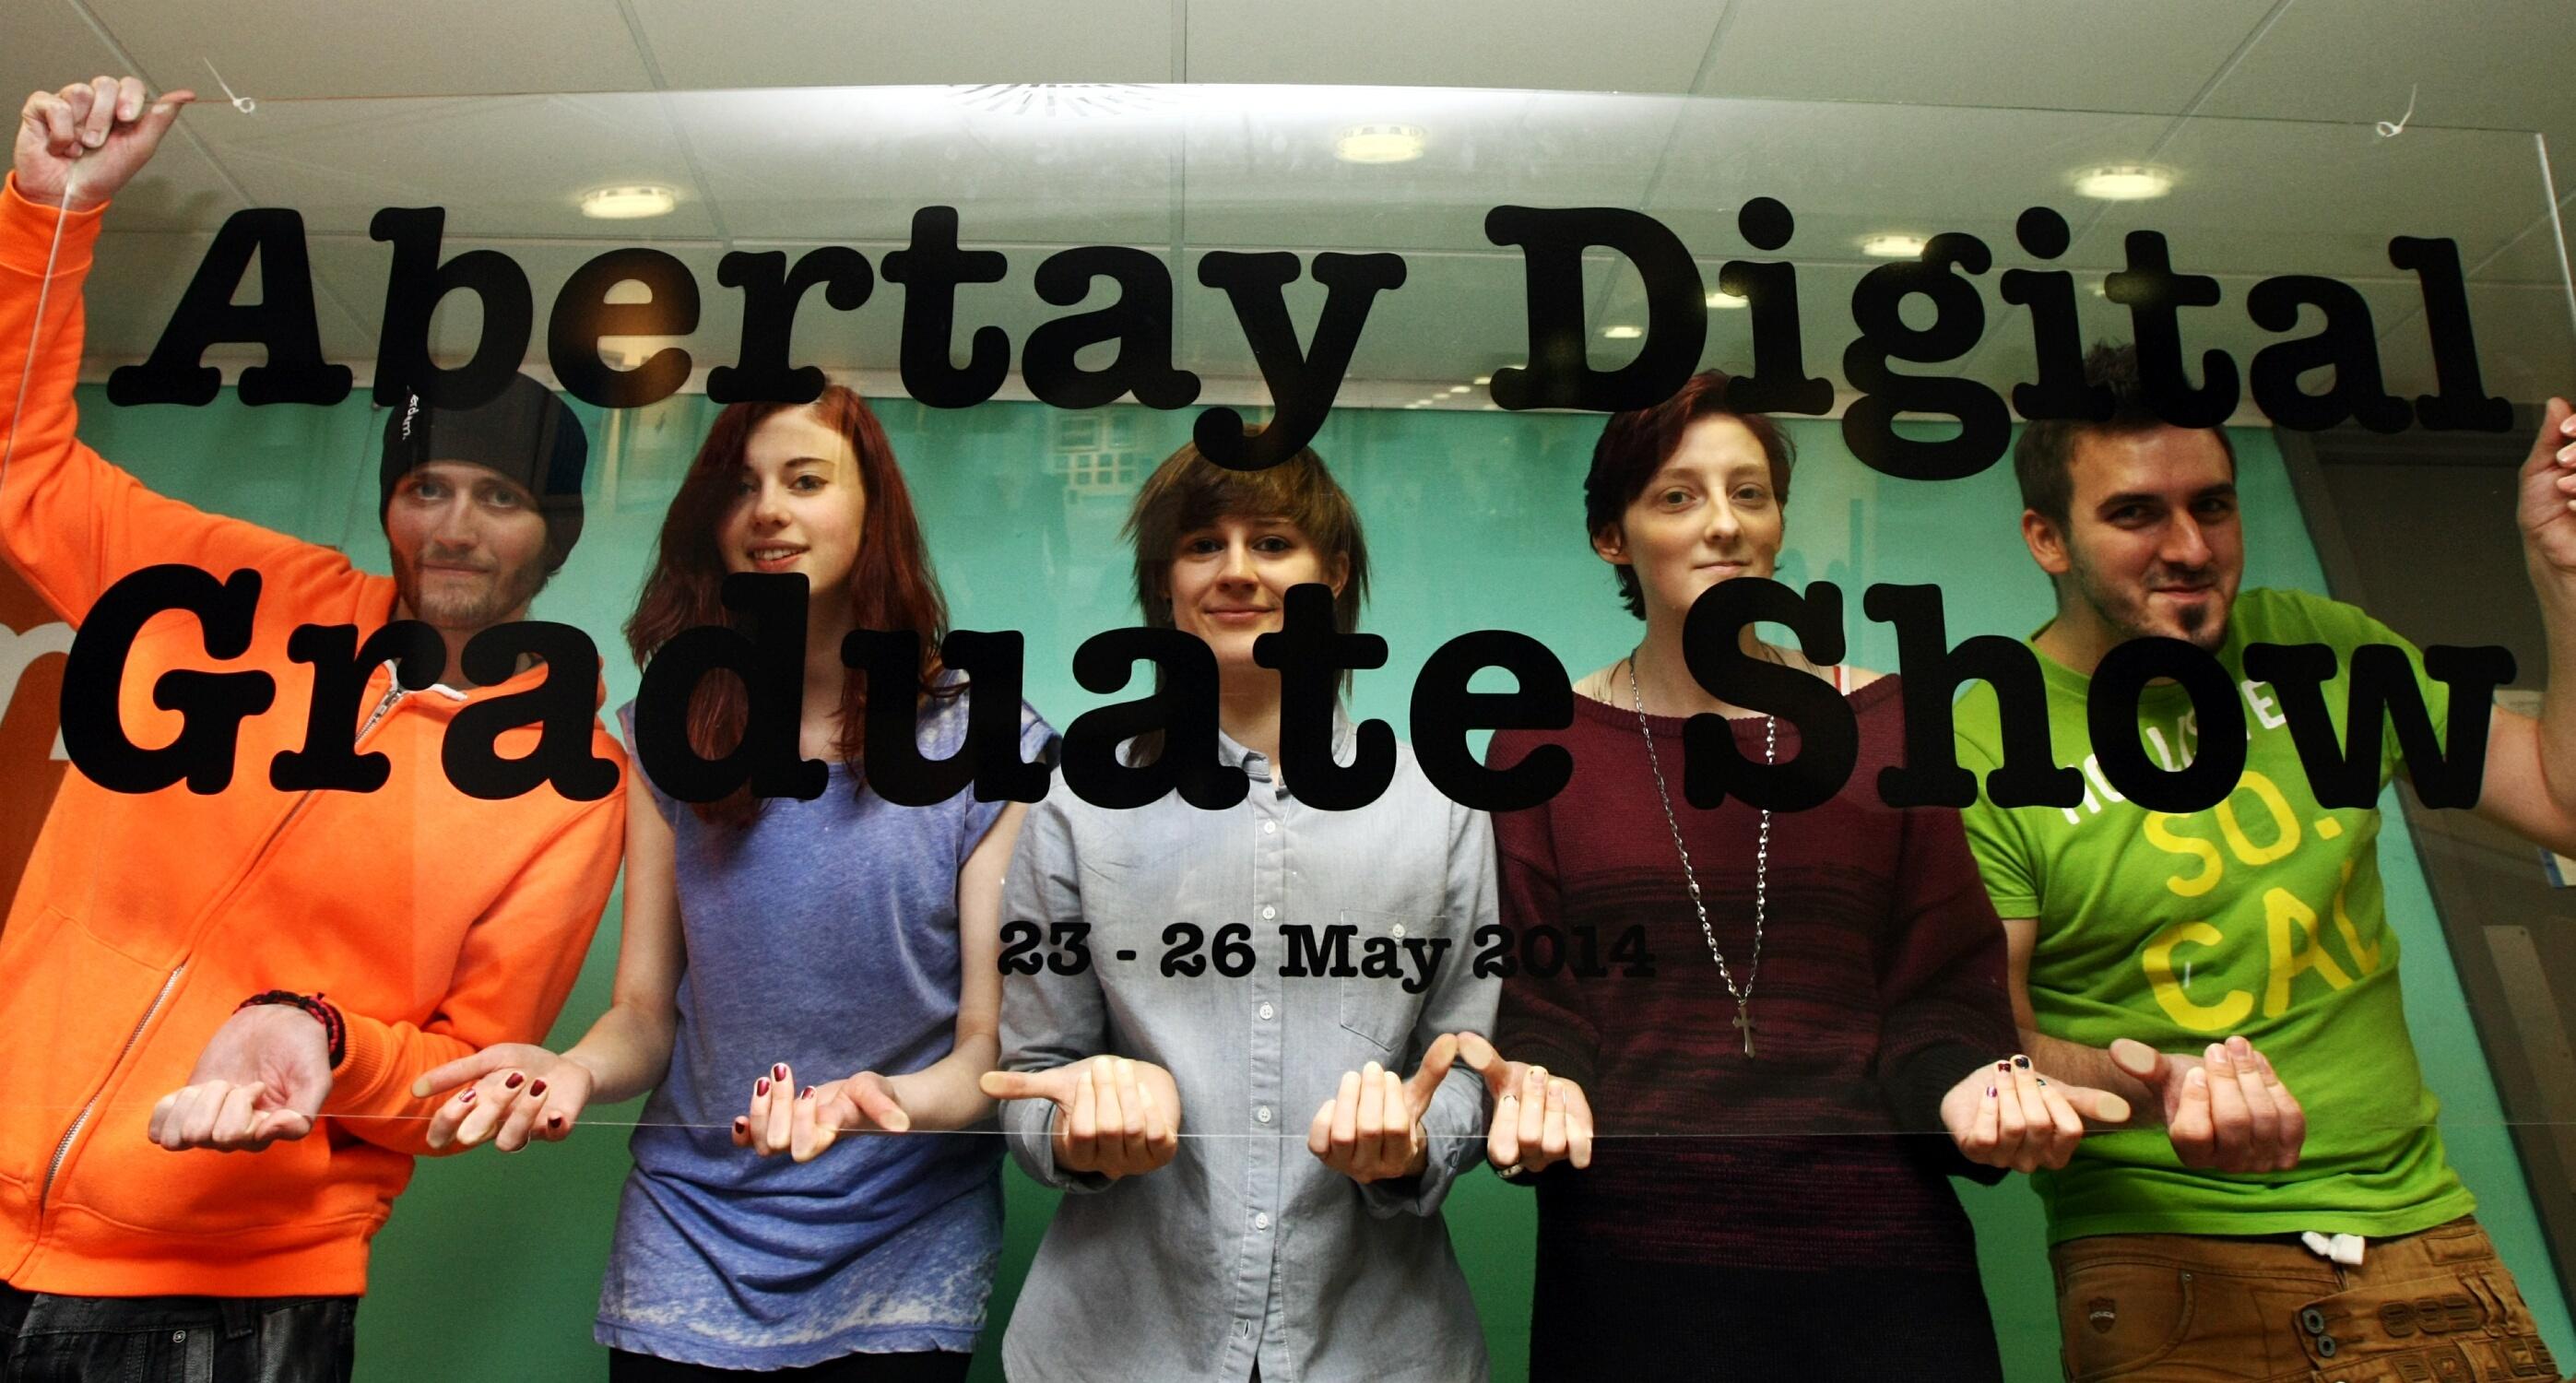 Students at the Hannah Maclure Centre at the University of Abertay